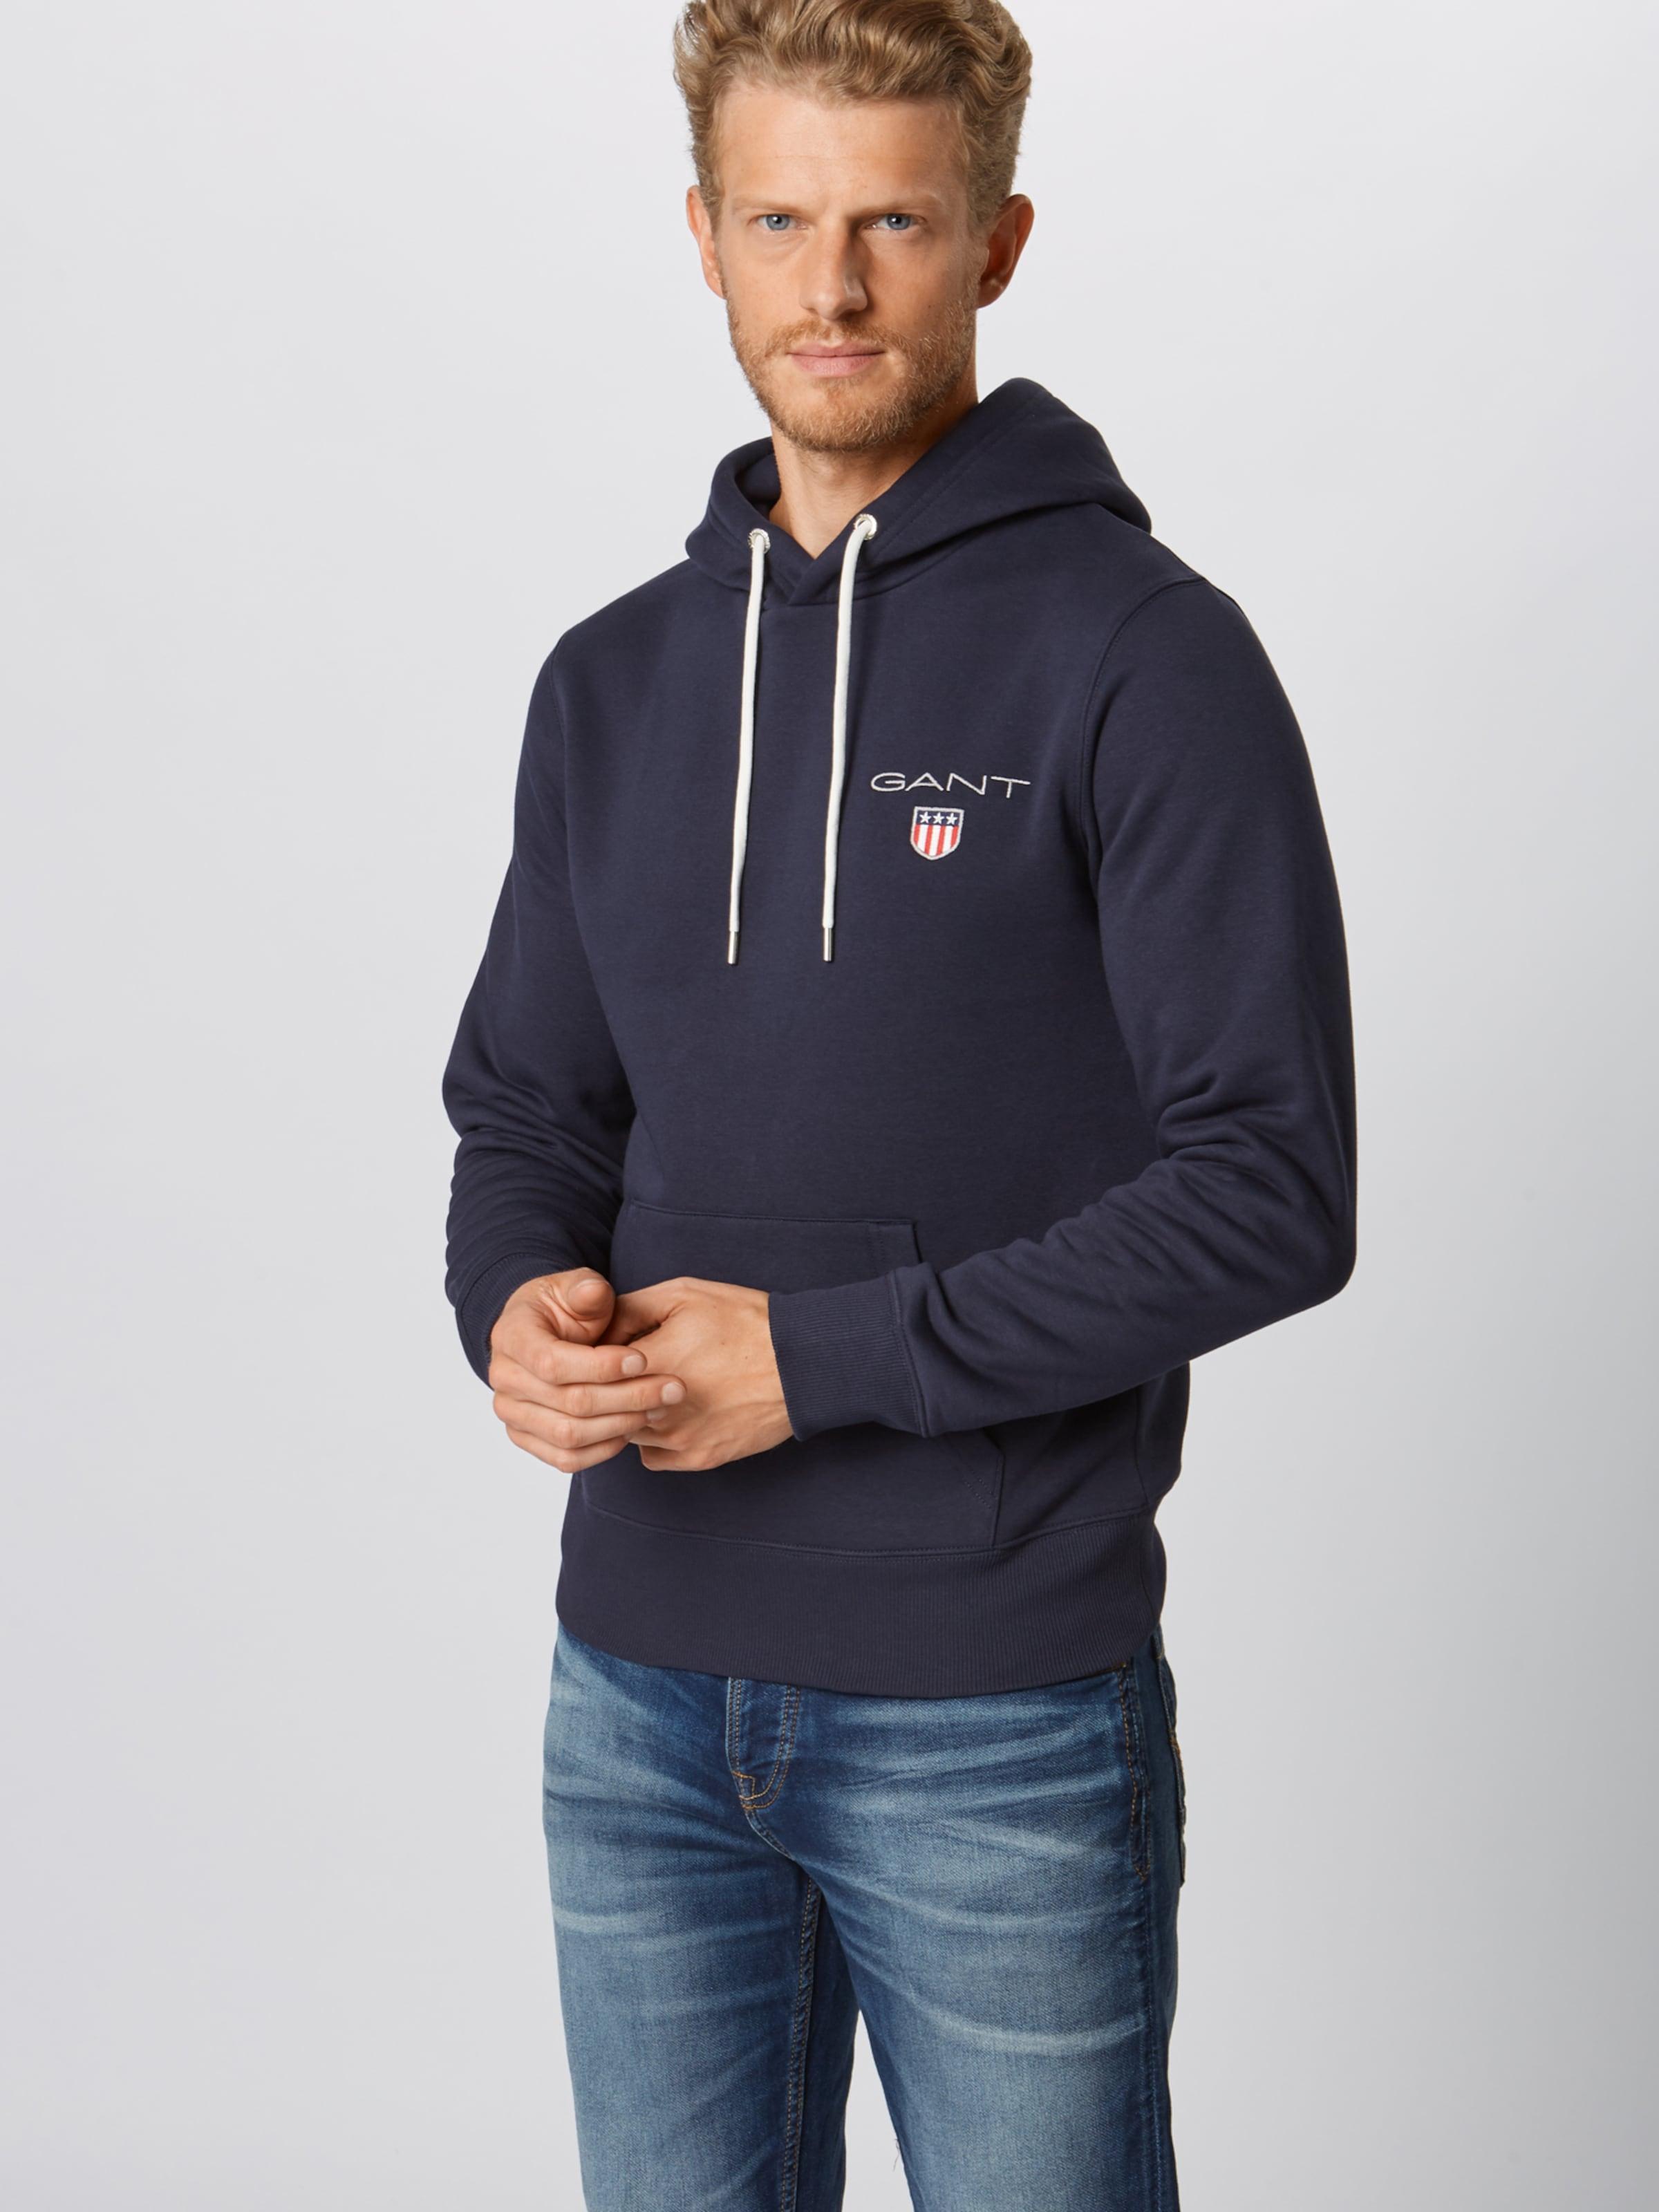 Dunkelblau Shield' In Sweatshirt Gant 'medium v0wON8nm